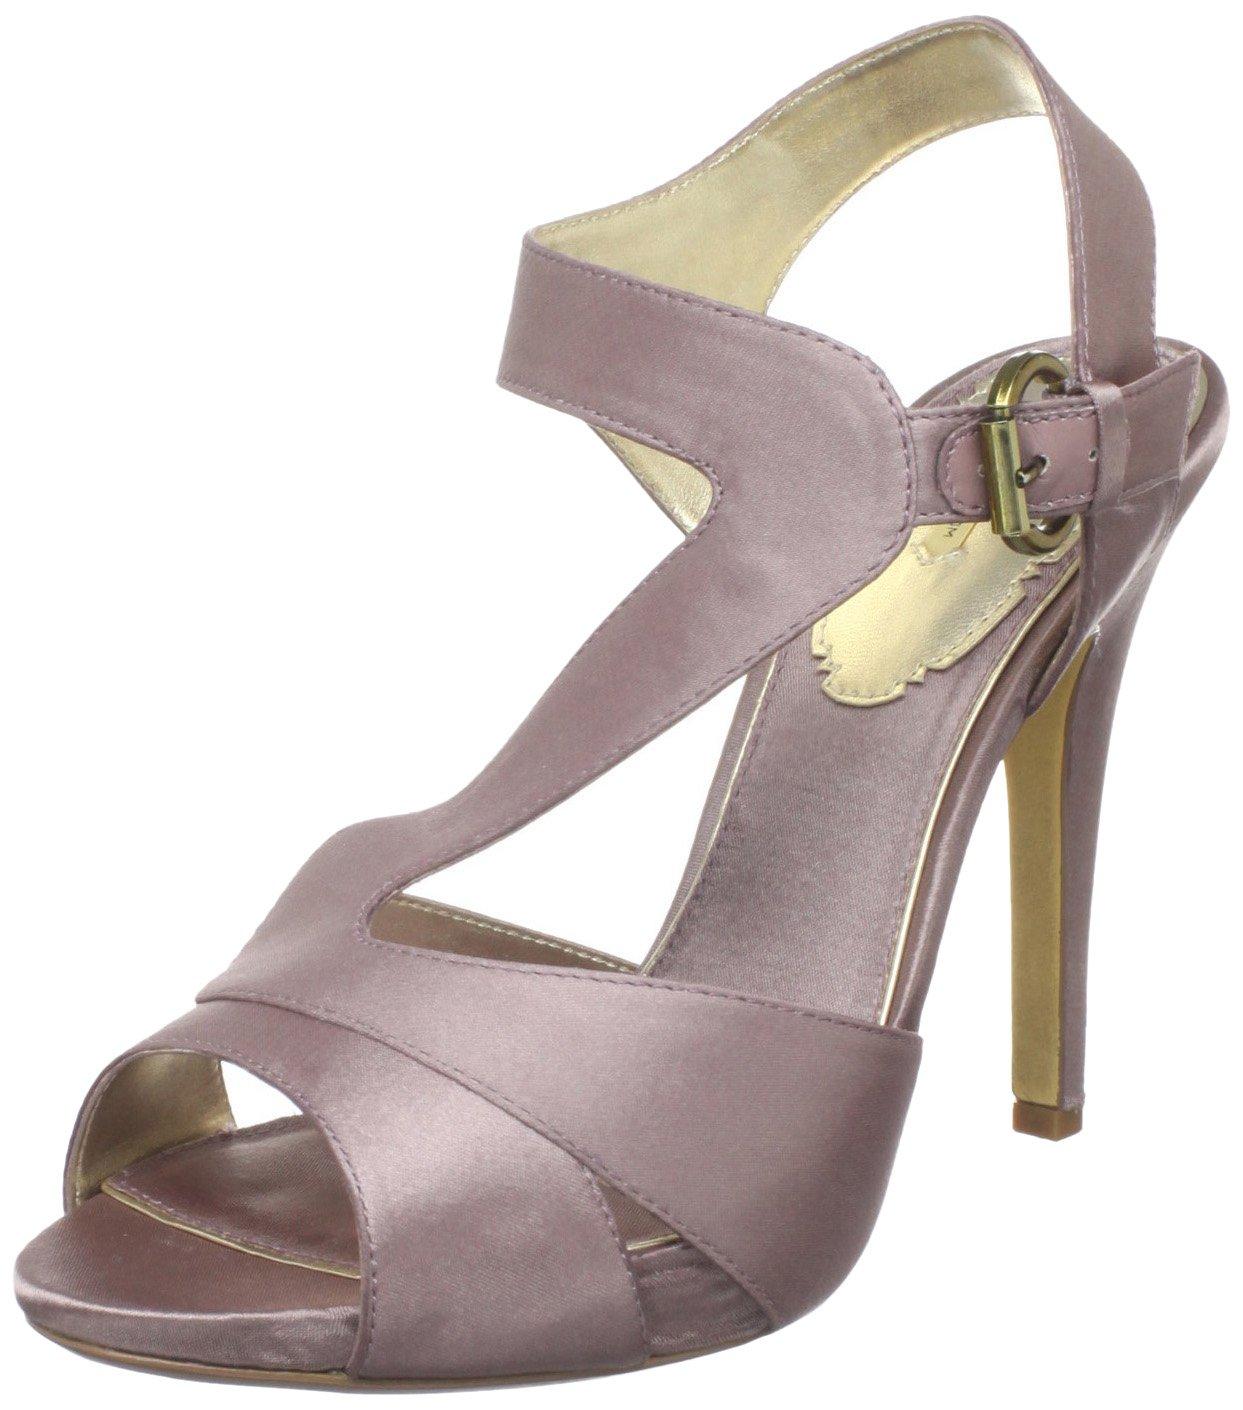 MAXSTUDIO Women's Eirny Platform Sandal B004S5DCGC 7 B(M) US|Lilac